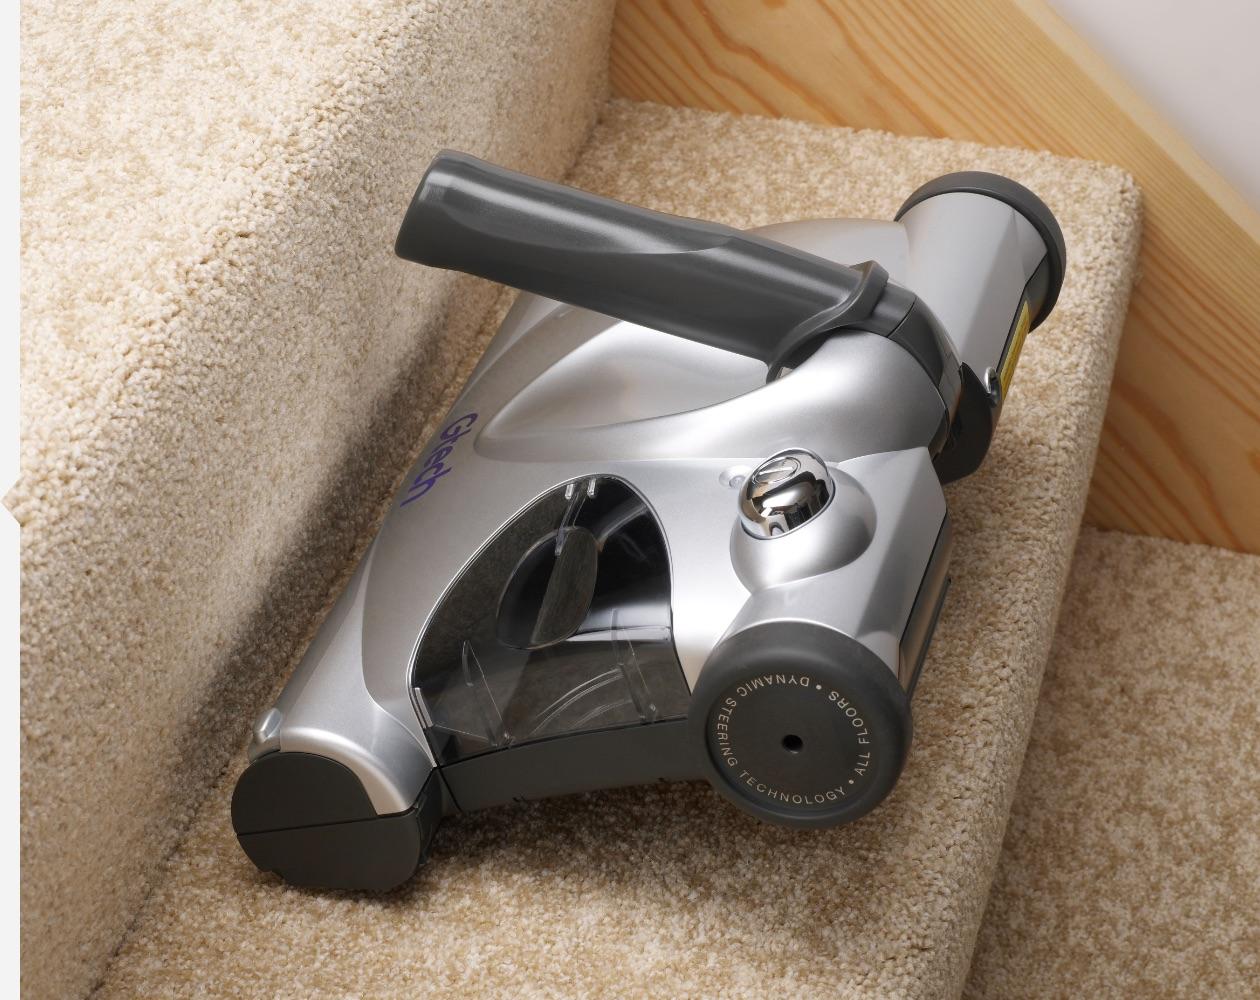 Portable SW02 advanced carpet sweeper